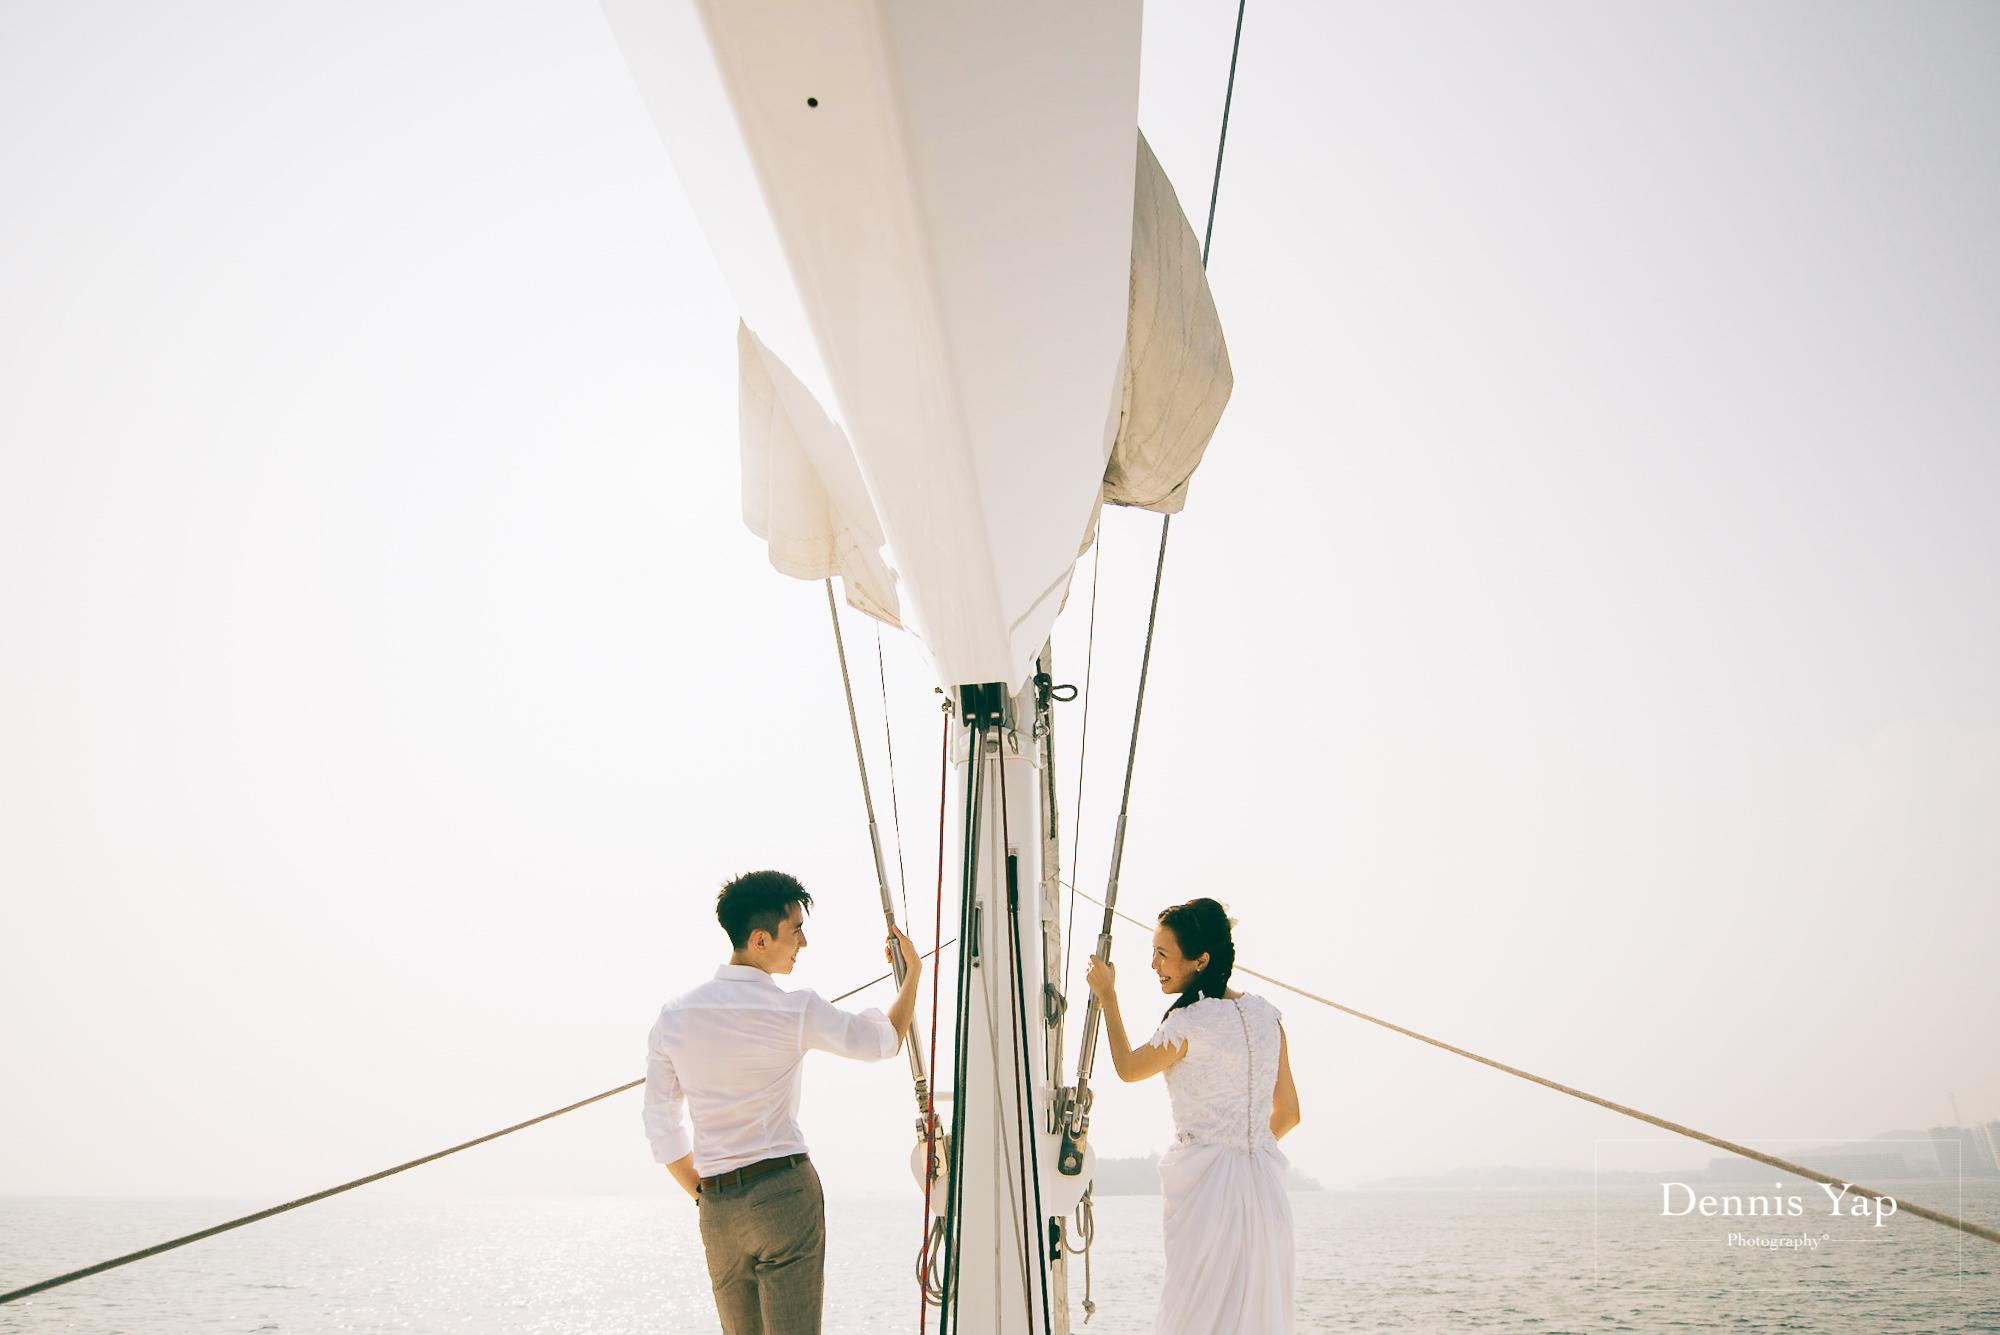 danny sherine wedding reception registration of marriage yacht fun beloved sea dennis yap photography malaysia top wedding photographer-28.jpg